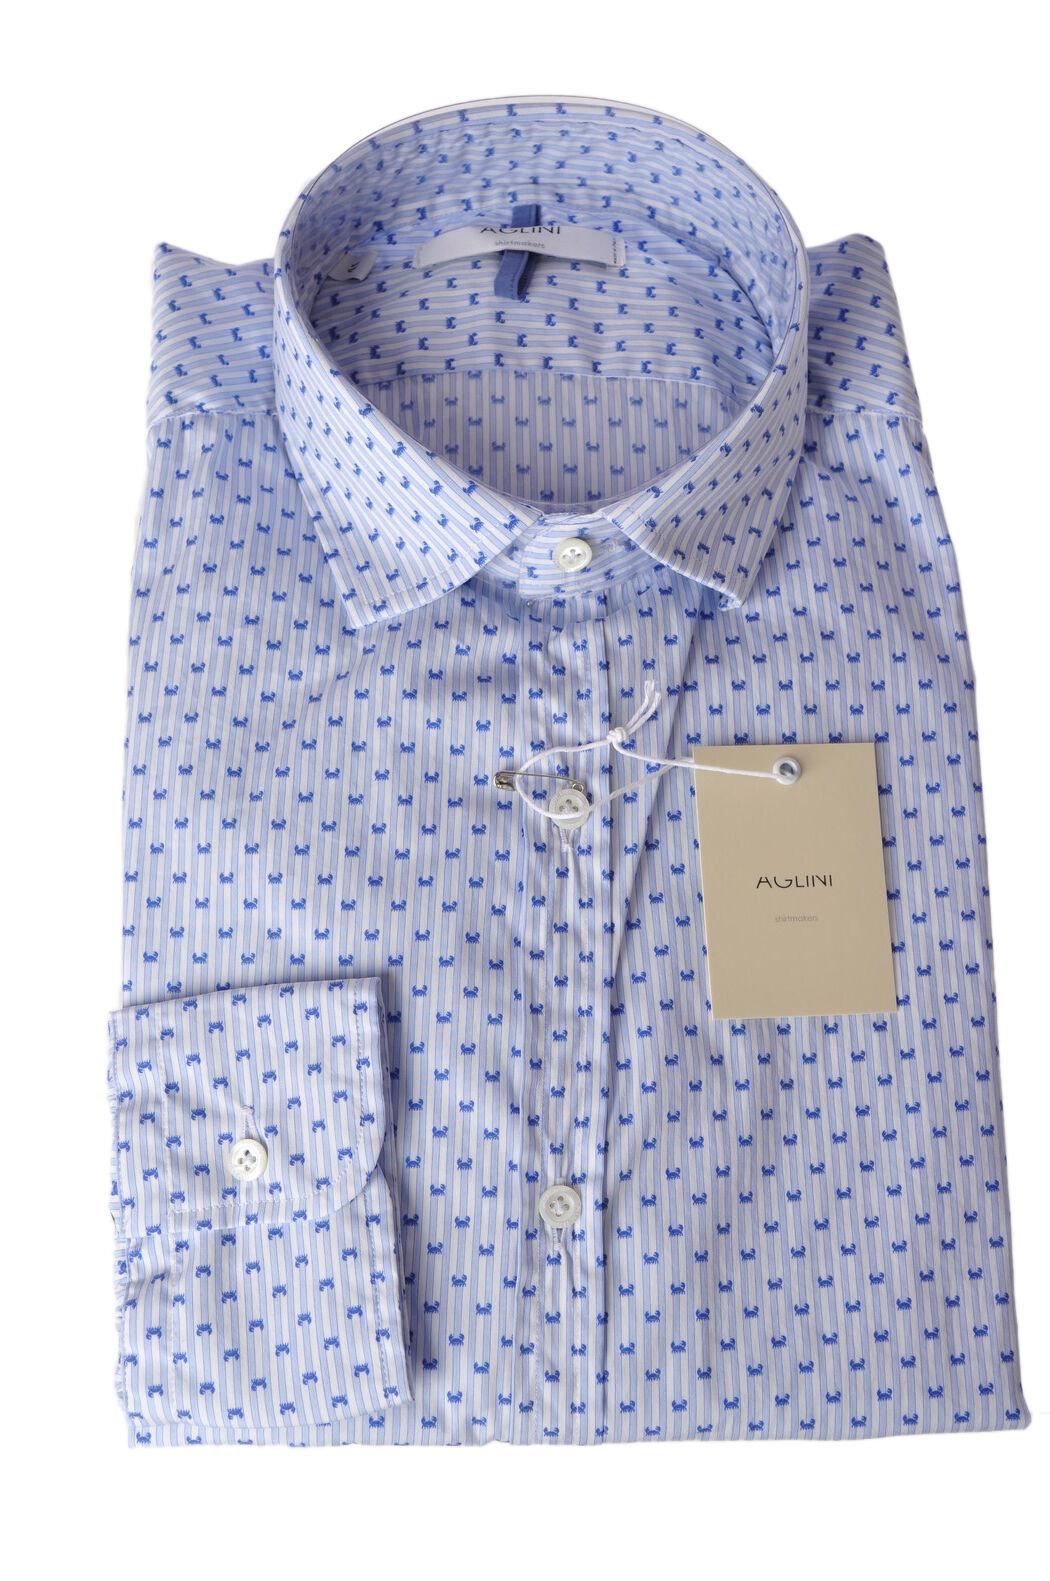 Aglini  -  Shirts - male - 302827A184016